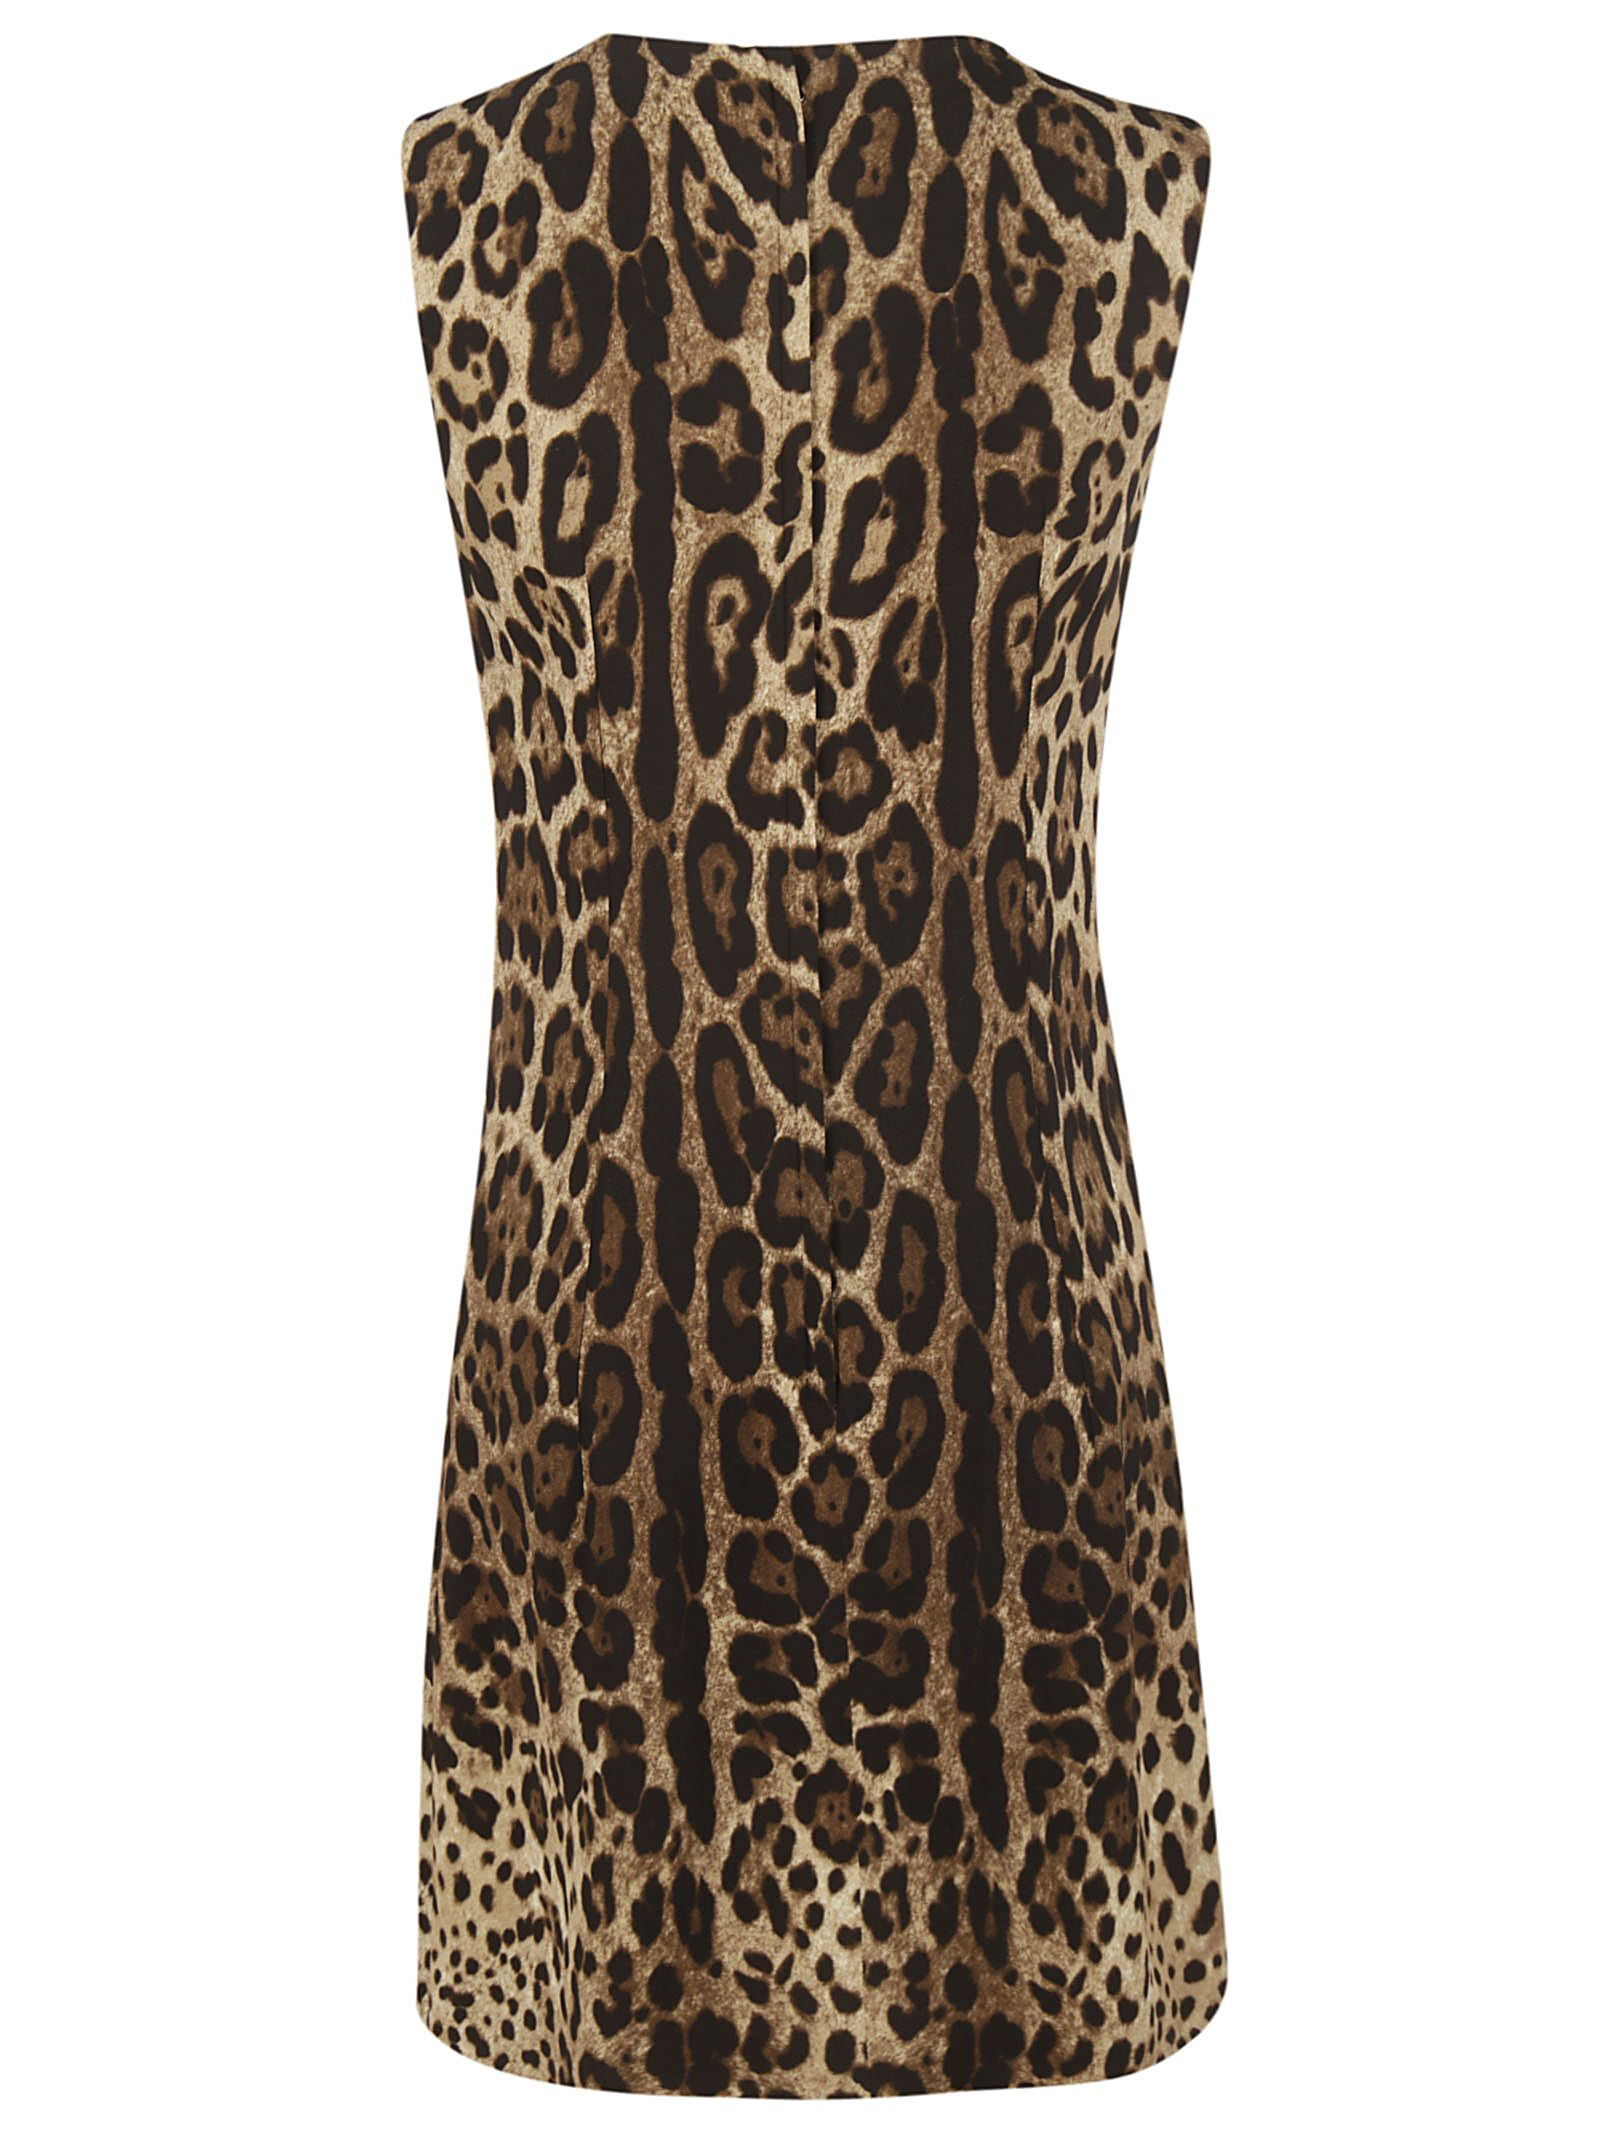 d69af33bd79b Dolce & Gabbana Dolce & Gabbana Leopard Print Dress - Basic ...